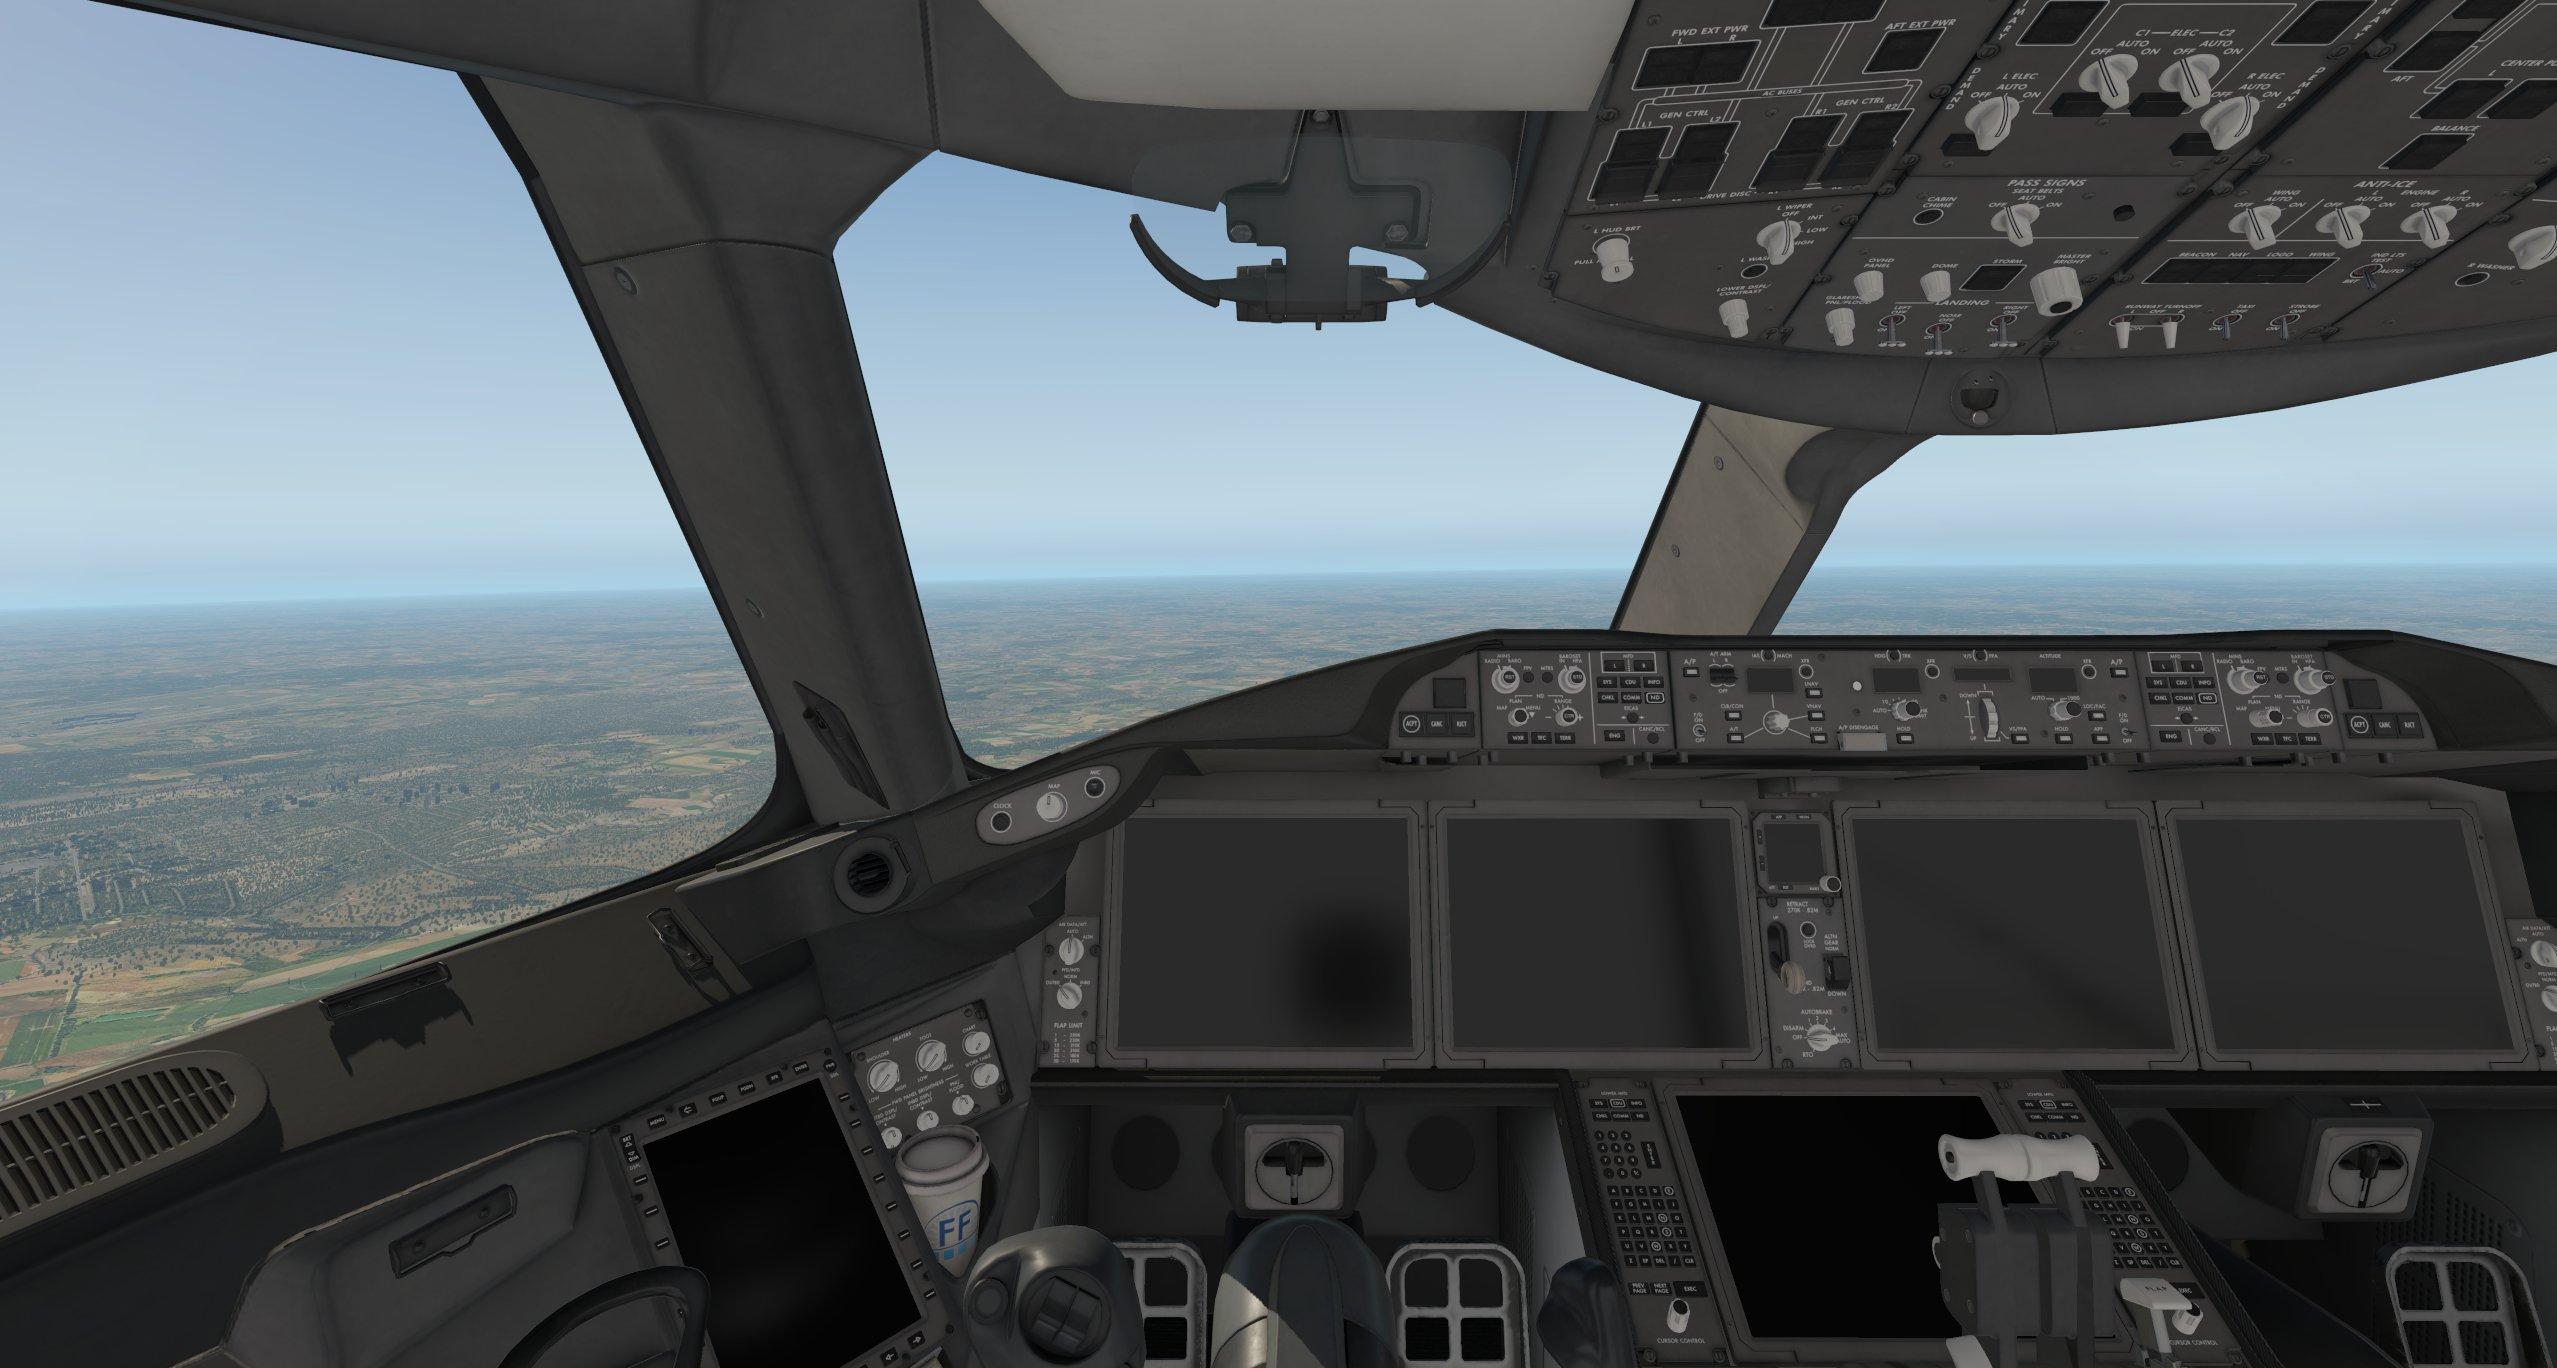 FlightFactor Shares New Previews of 787 Pro